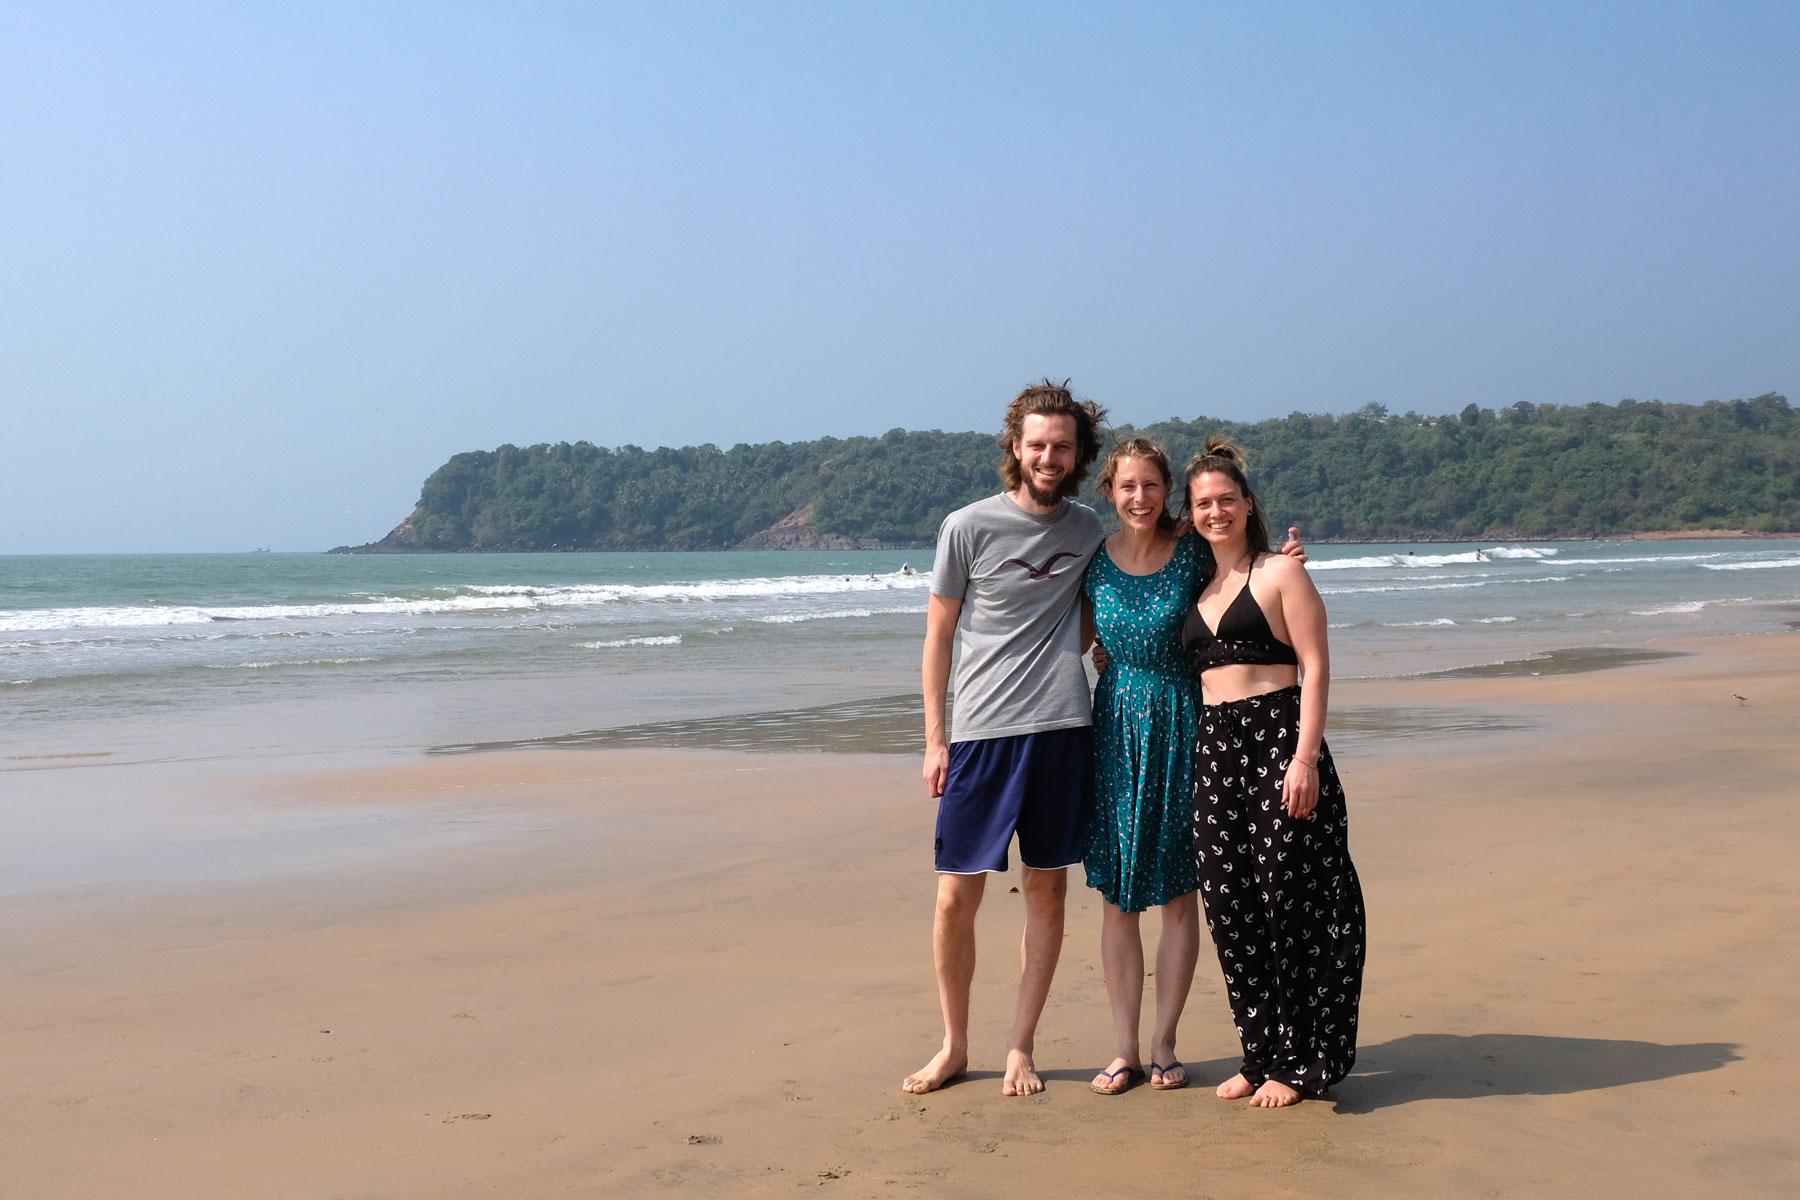 Sebastian und Leo mit Kathi am Strand in Agonda in Goa.